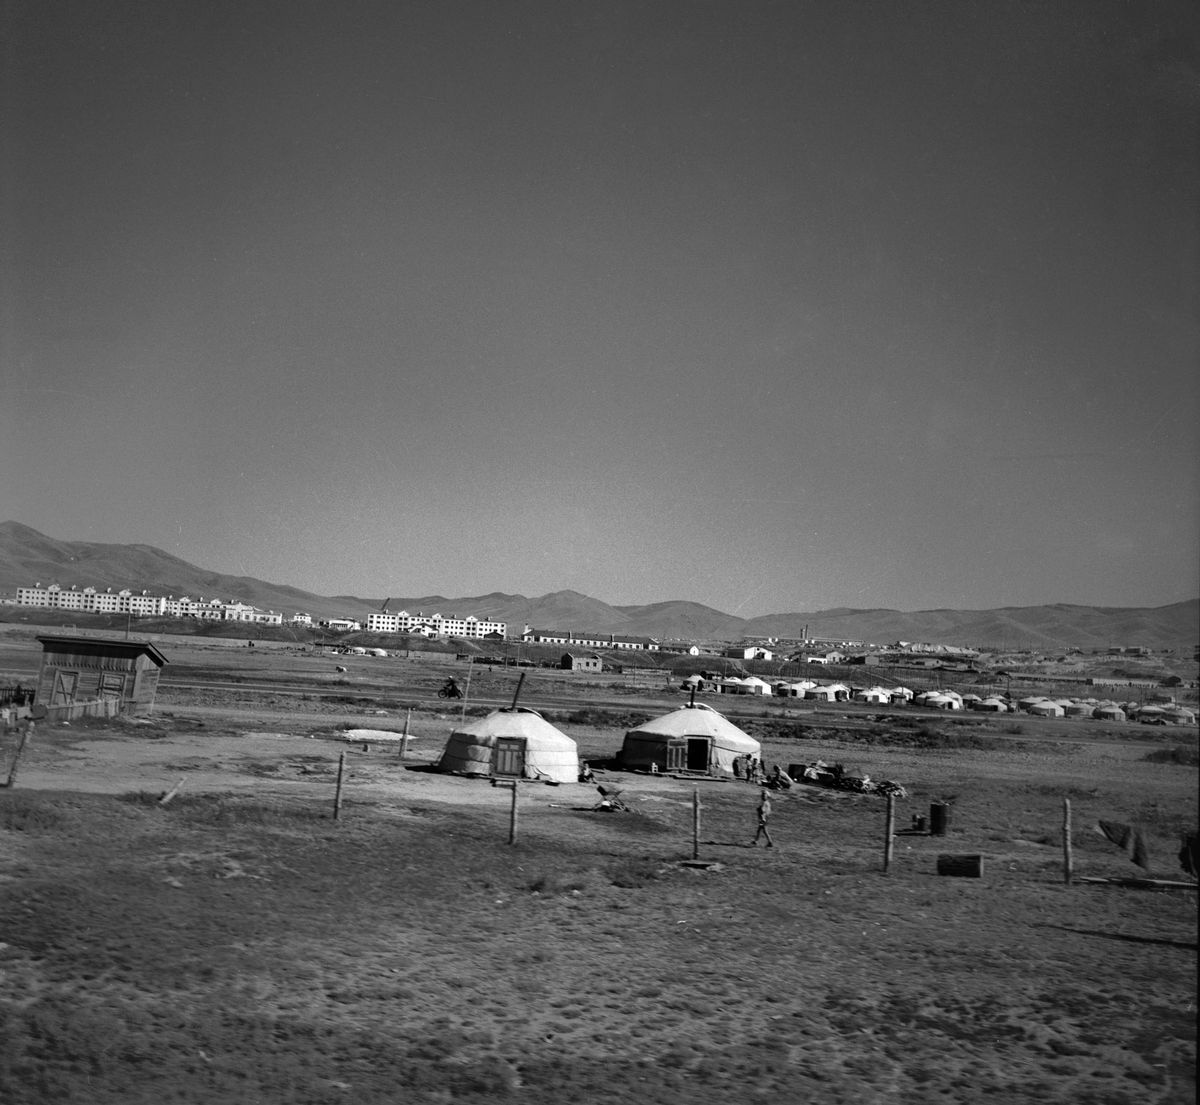 Vue d'Oulan Bator (Mongolie extérieure), en 1965.